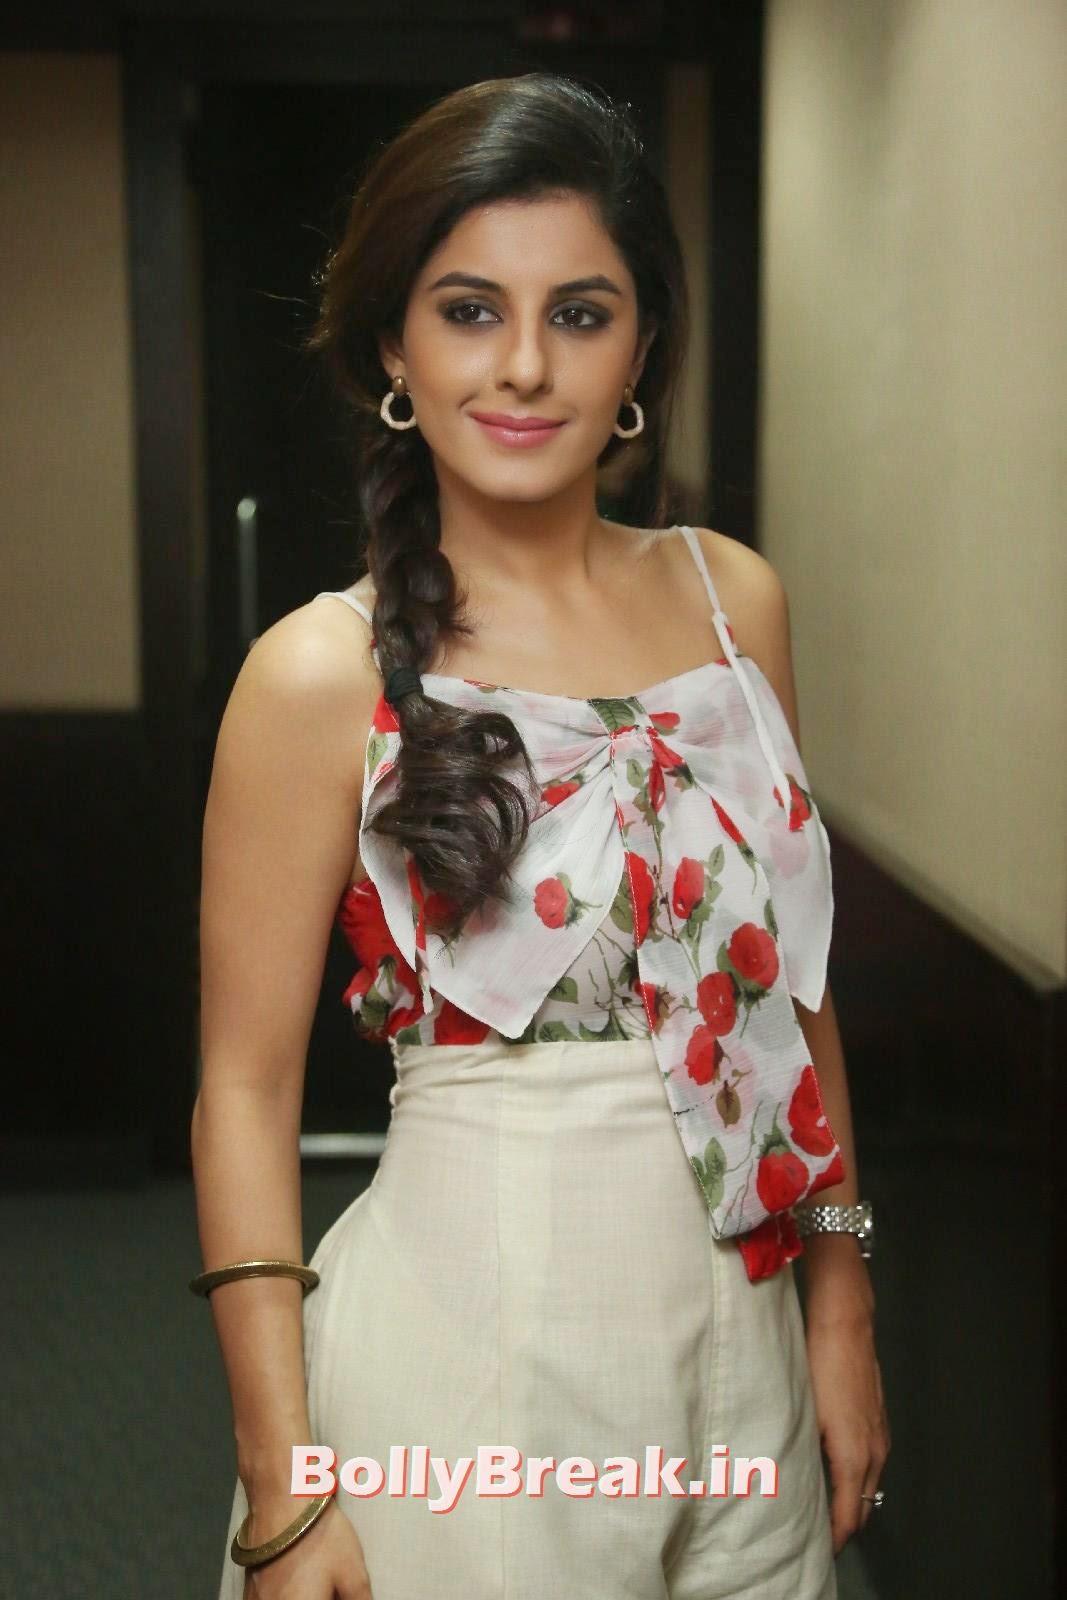 Isha Talwar (7), Isha Talwar Cute Pics - Beautiful South Actress